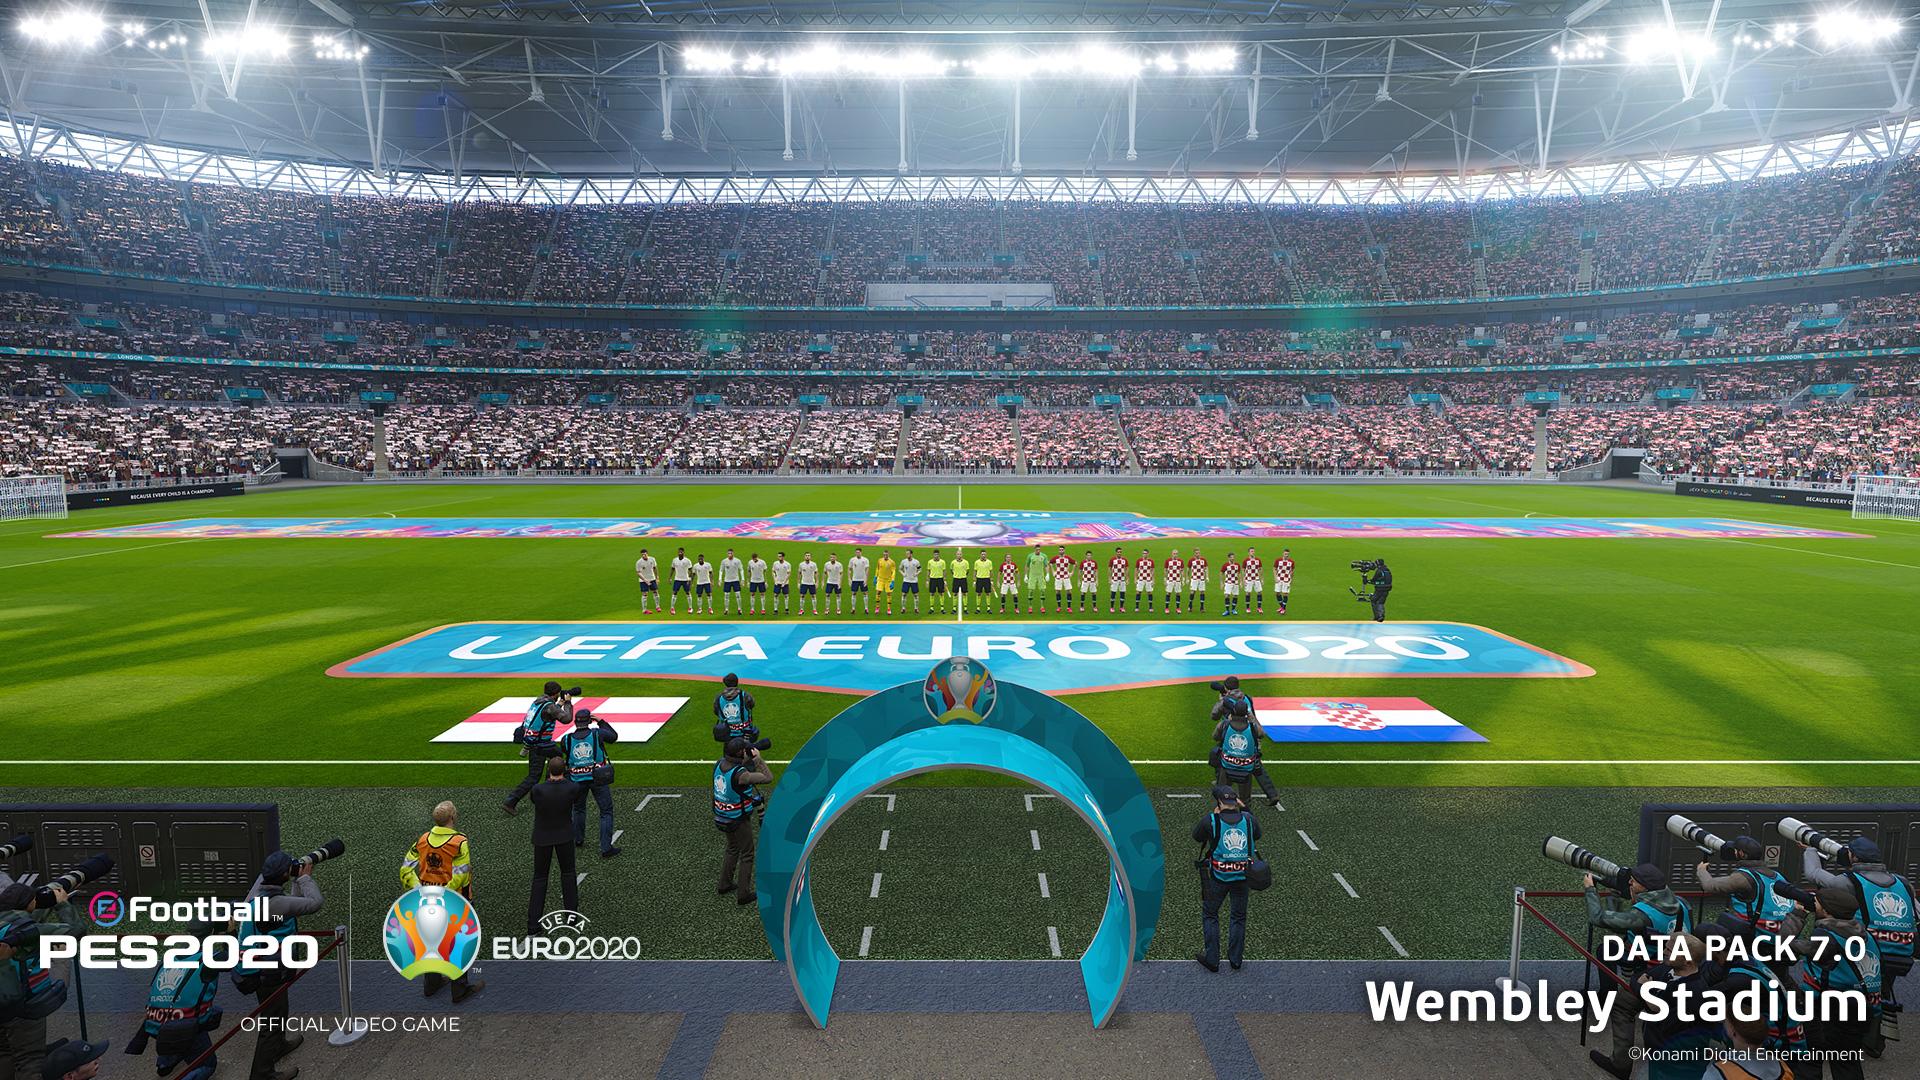 Uefa Euro 2020 per eFootball PES 2020 è finalmente disponibile thumbnail